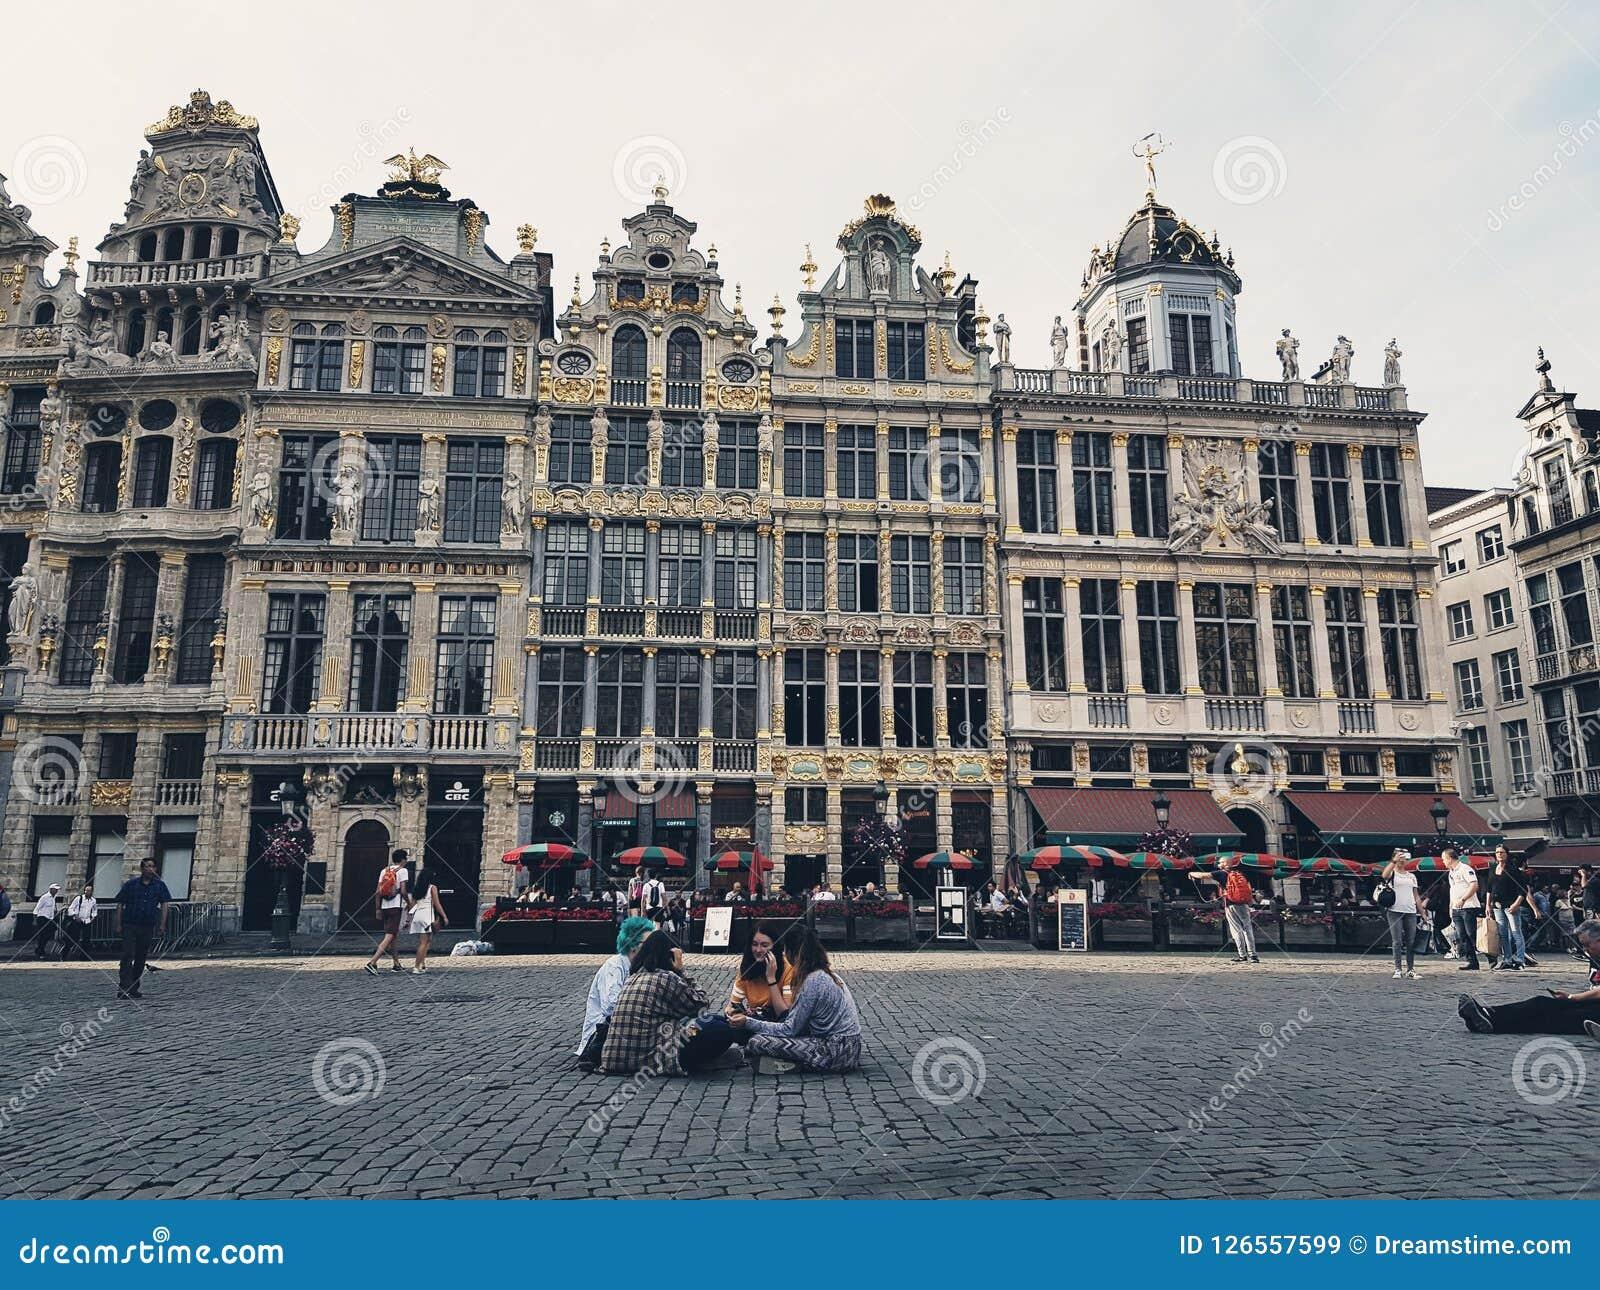 brussels, belgium, travel, town, europe editorial stock image